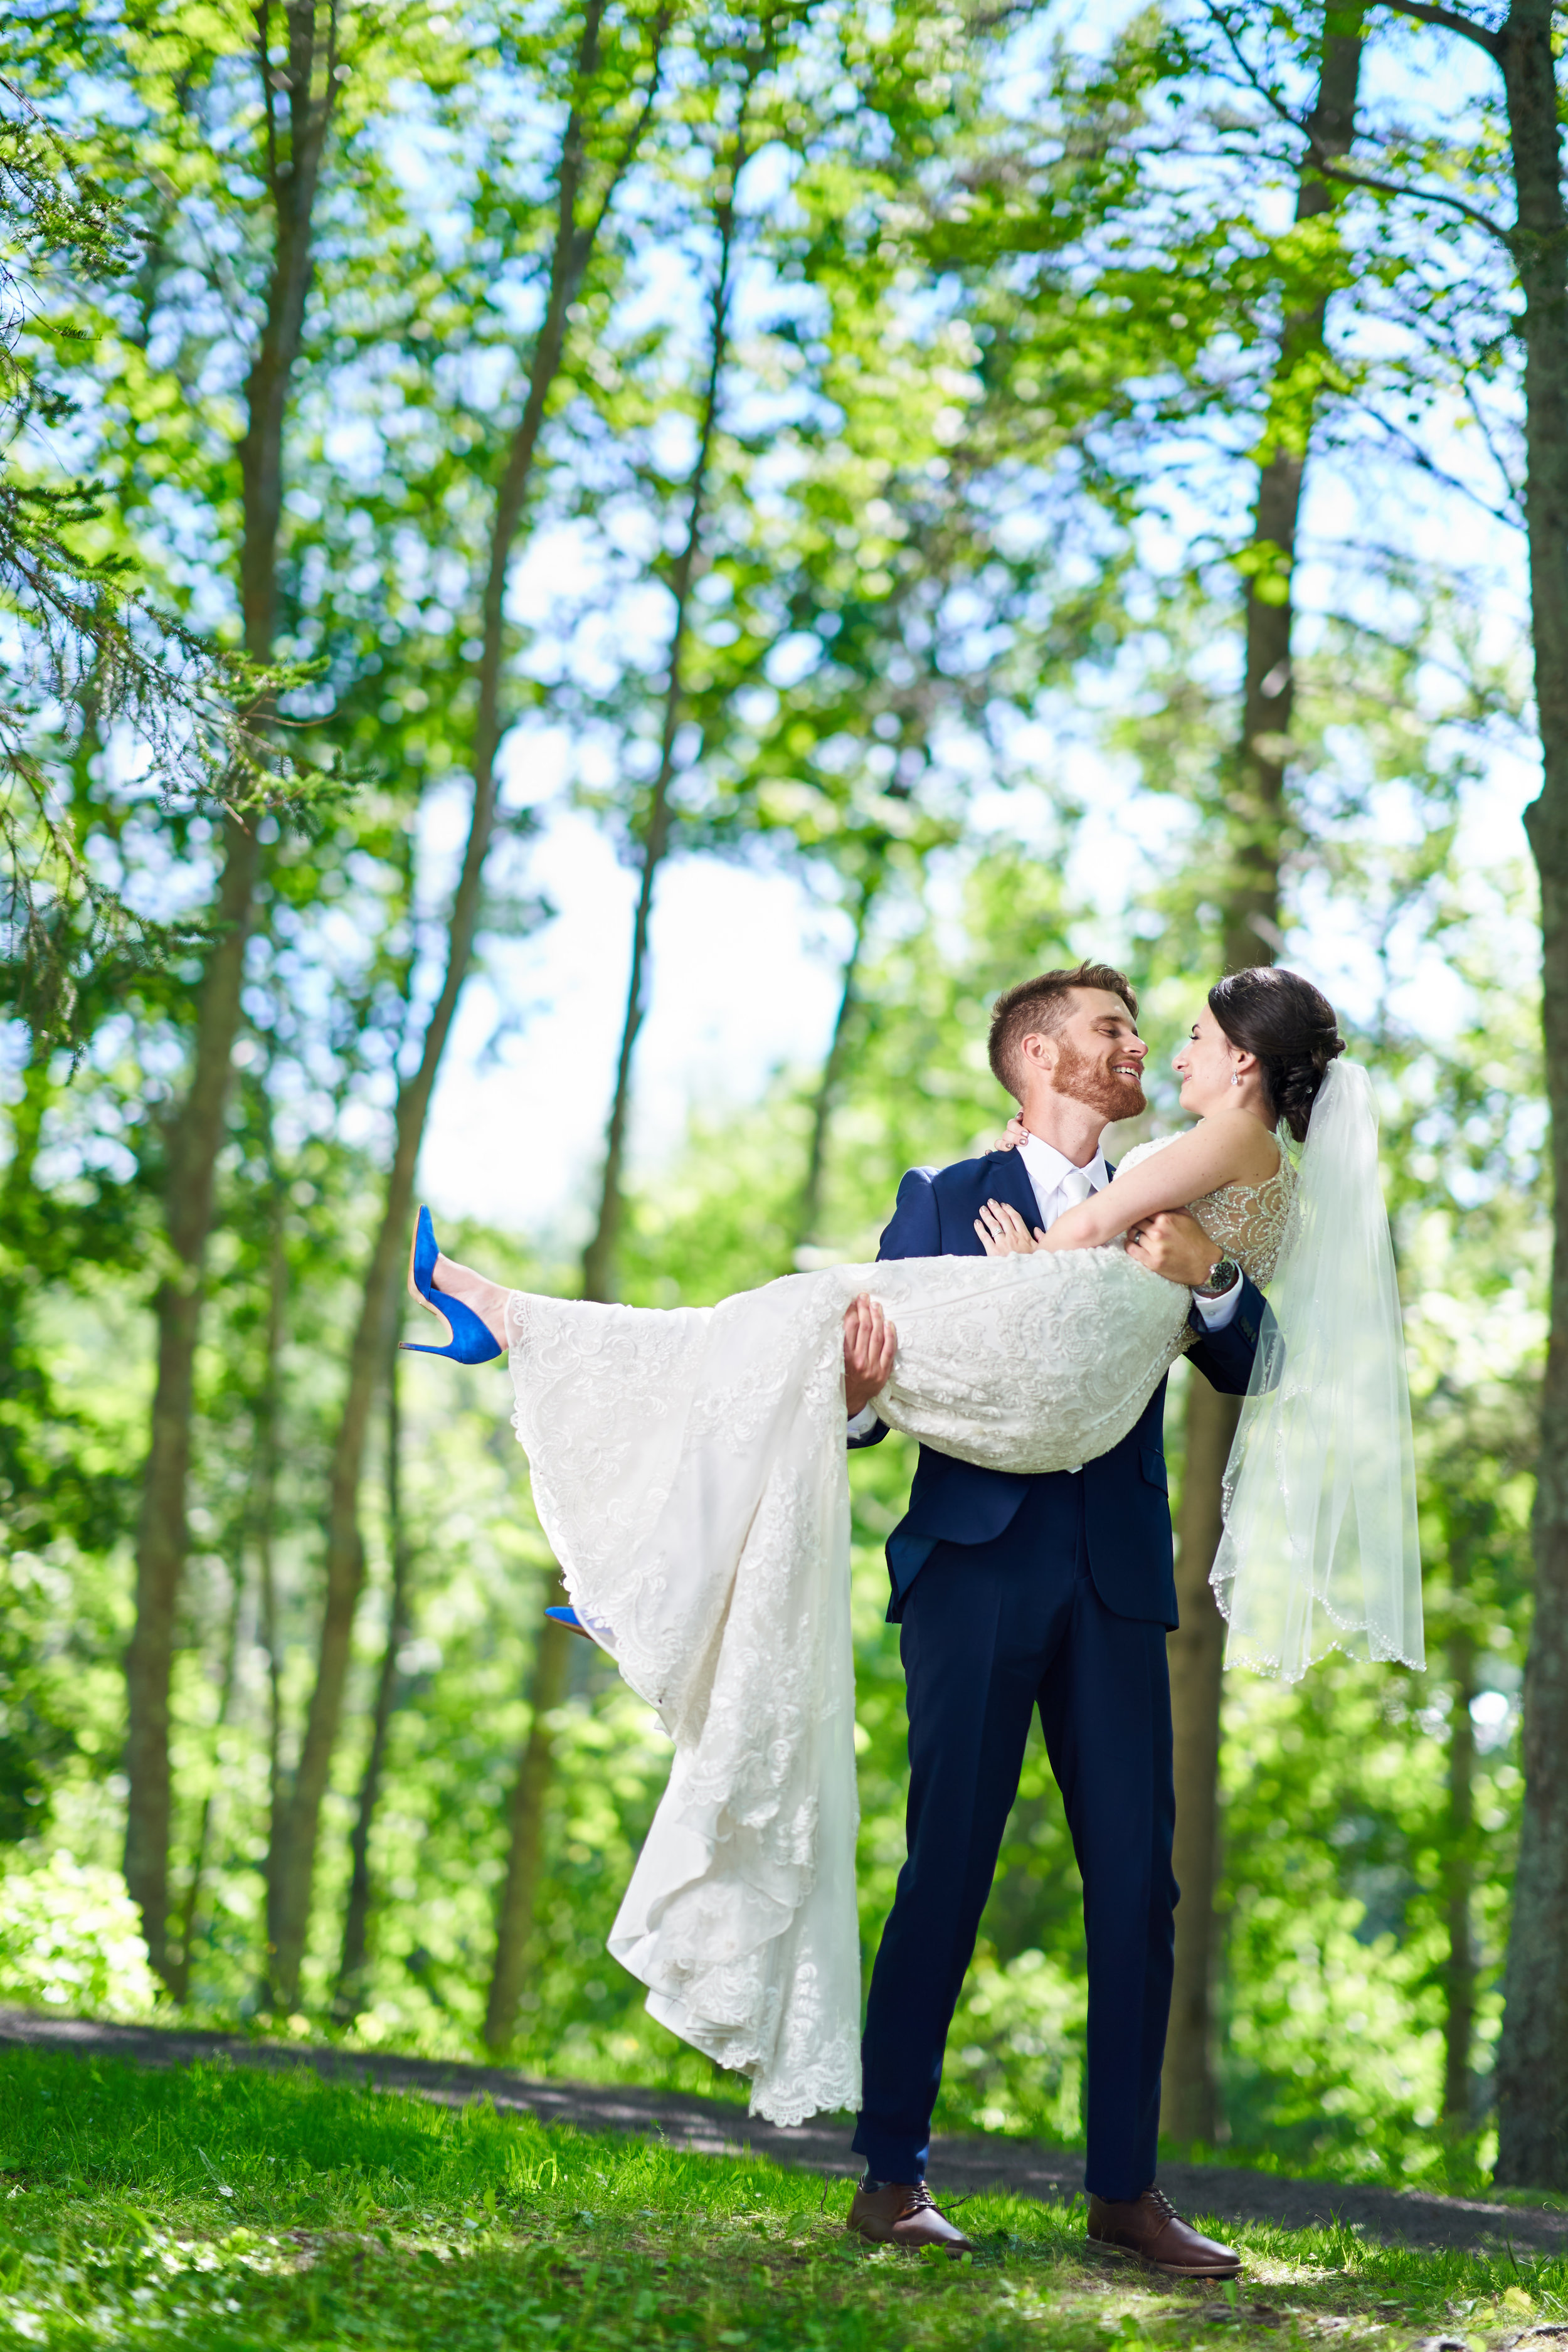 Mélanie & Ben's Wedding - 483.jpg